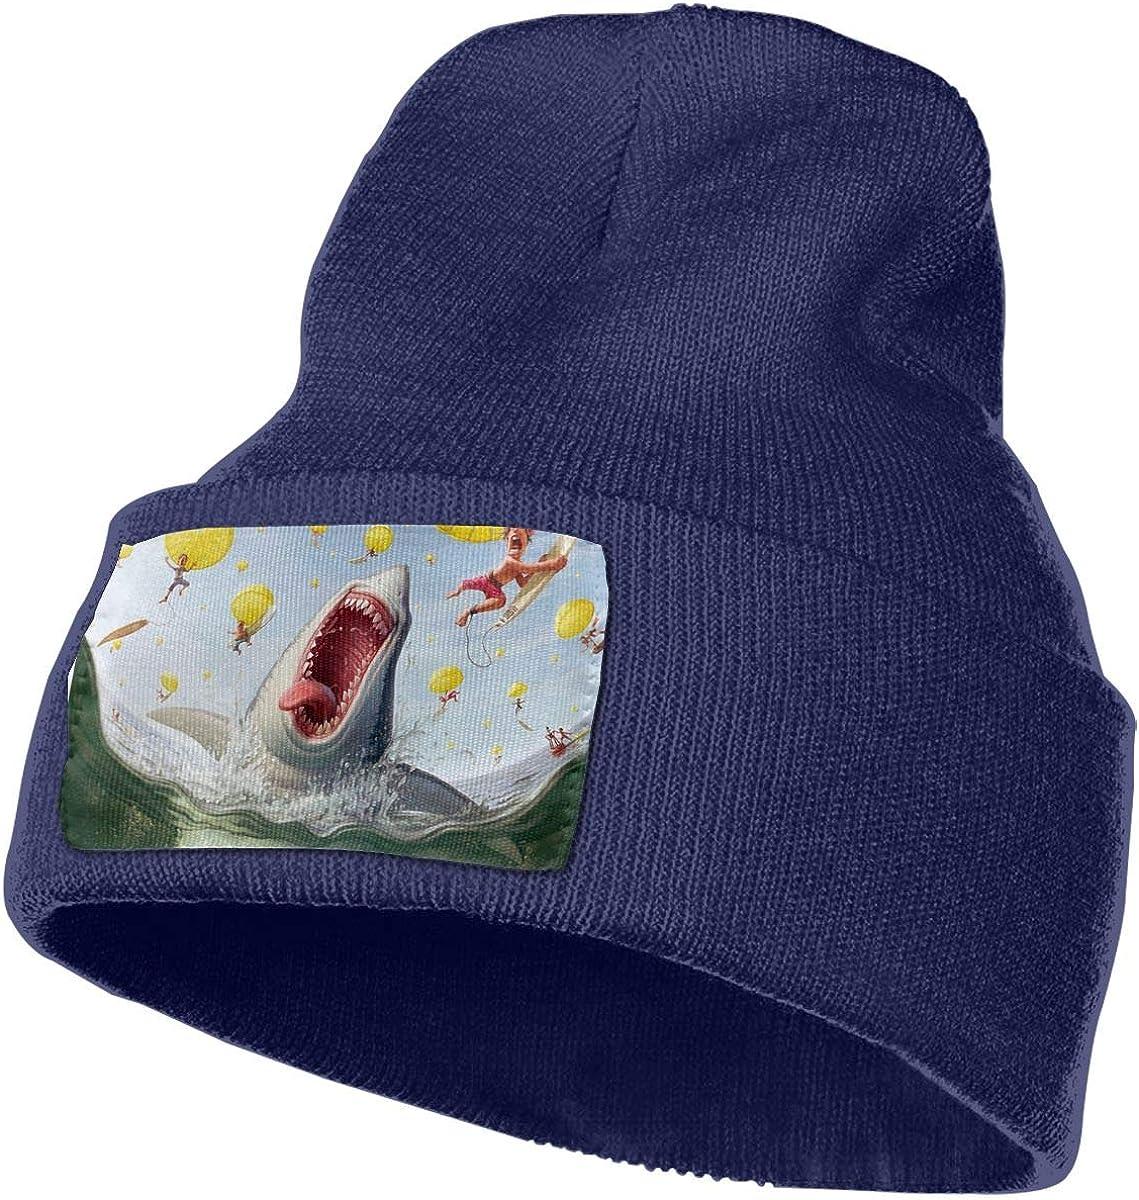 Shark-Humor Warm Knit Winter Solid Beanie Hat Unisex Skull Cap